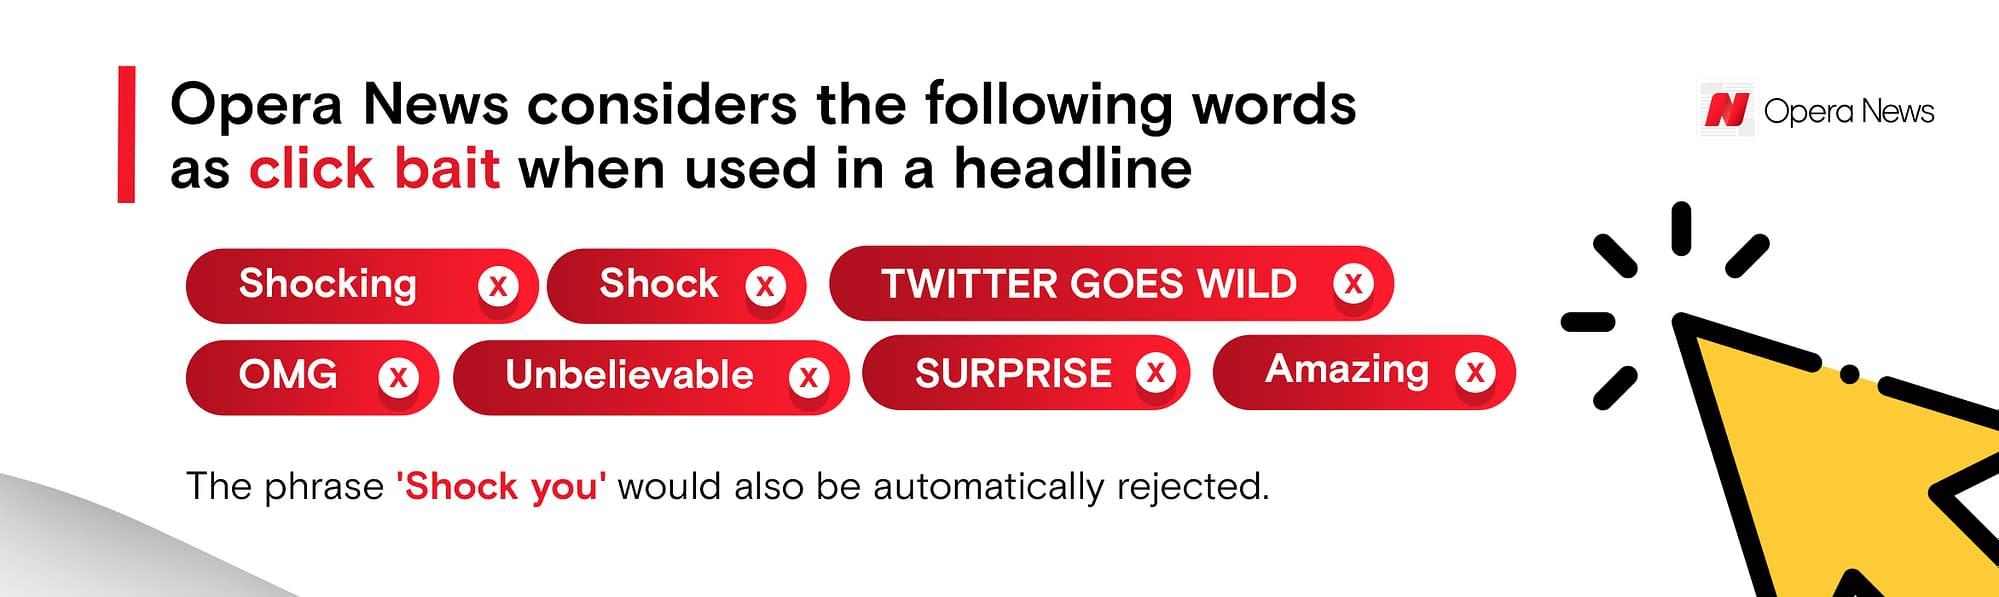 opera news hub banned words